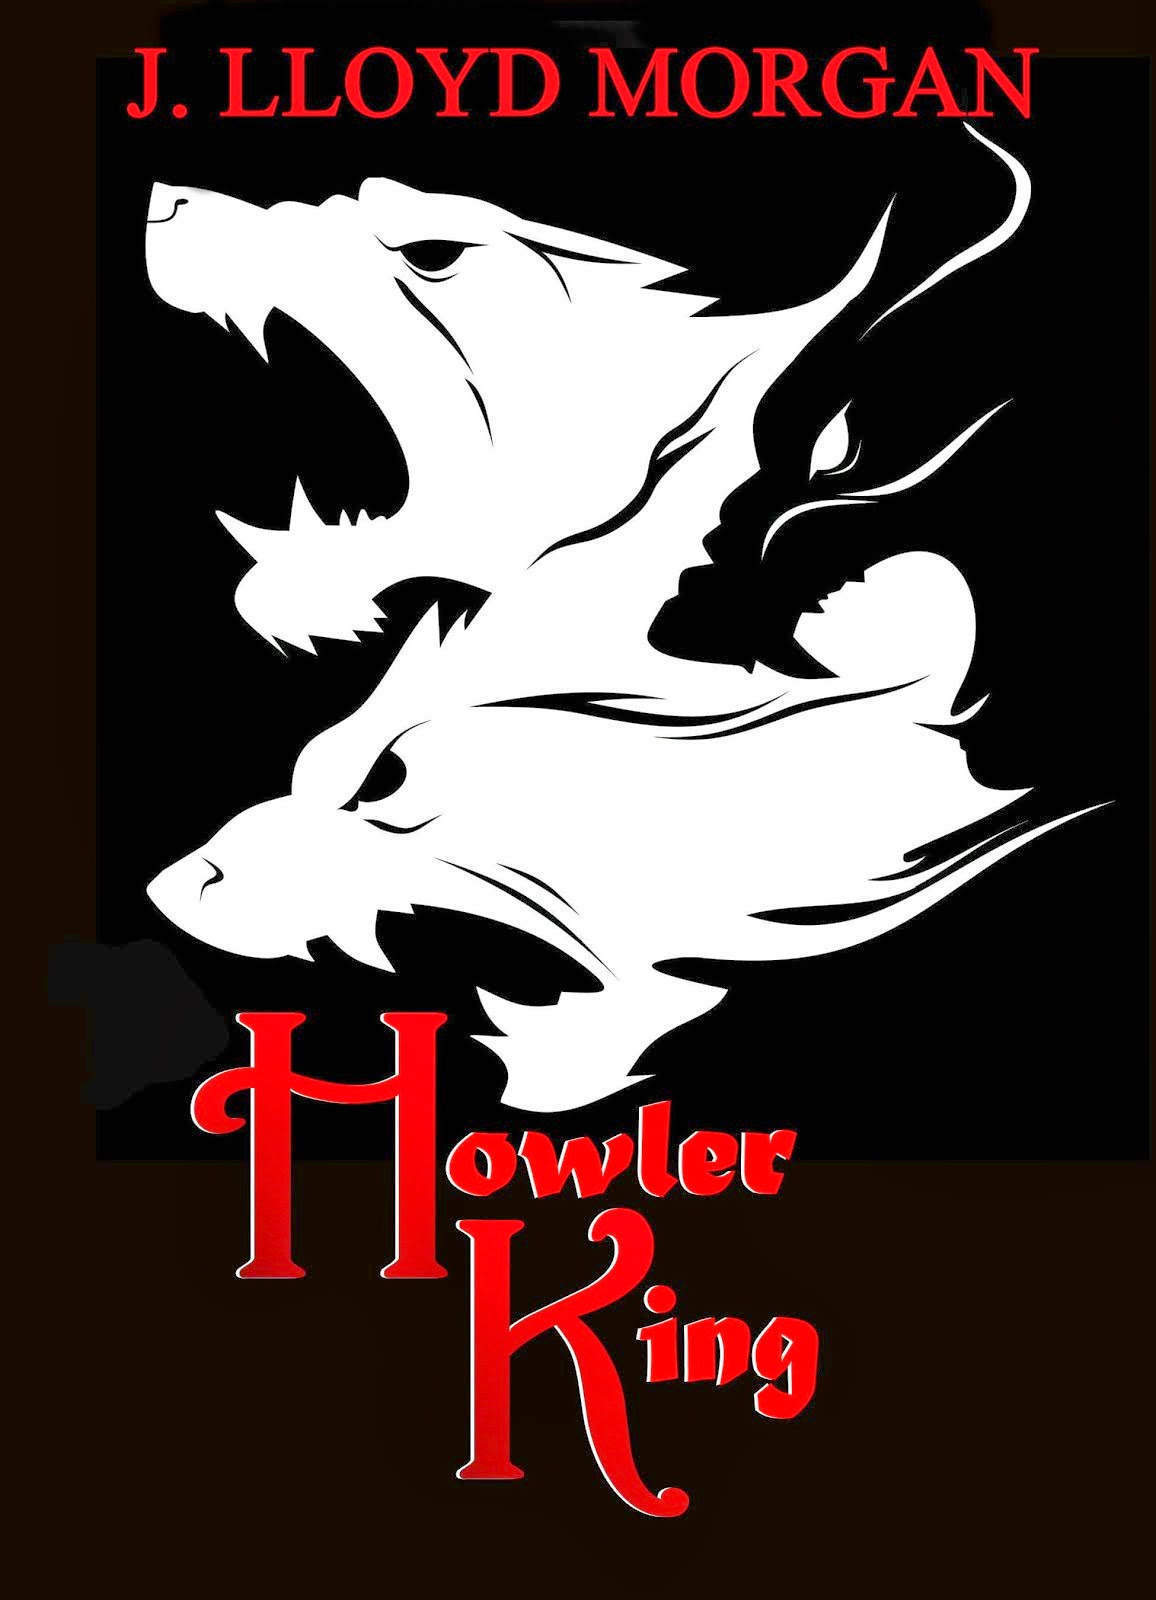 Howler King